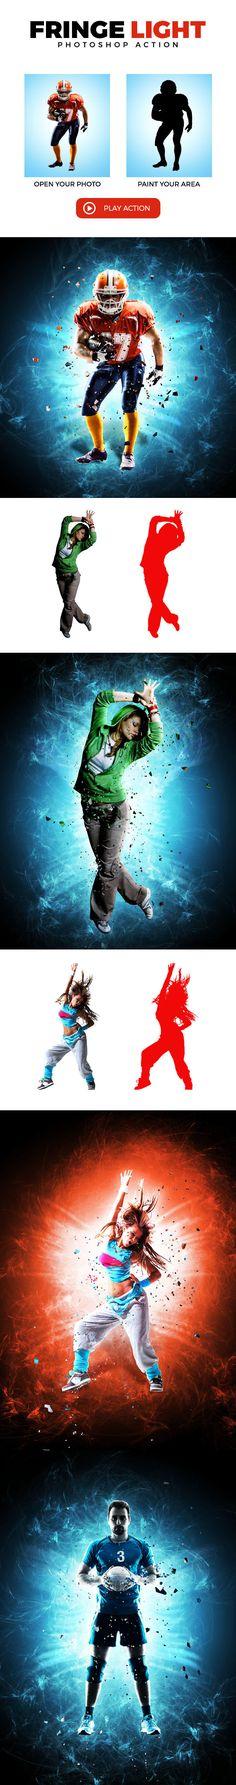 Fringe Light Photoshop Action #photoeffect Download: http://graphicriver.net/item/fringe-light-ps-action/14196533?ref=ksioks